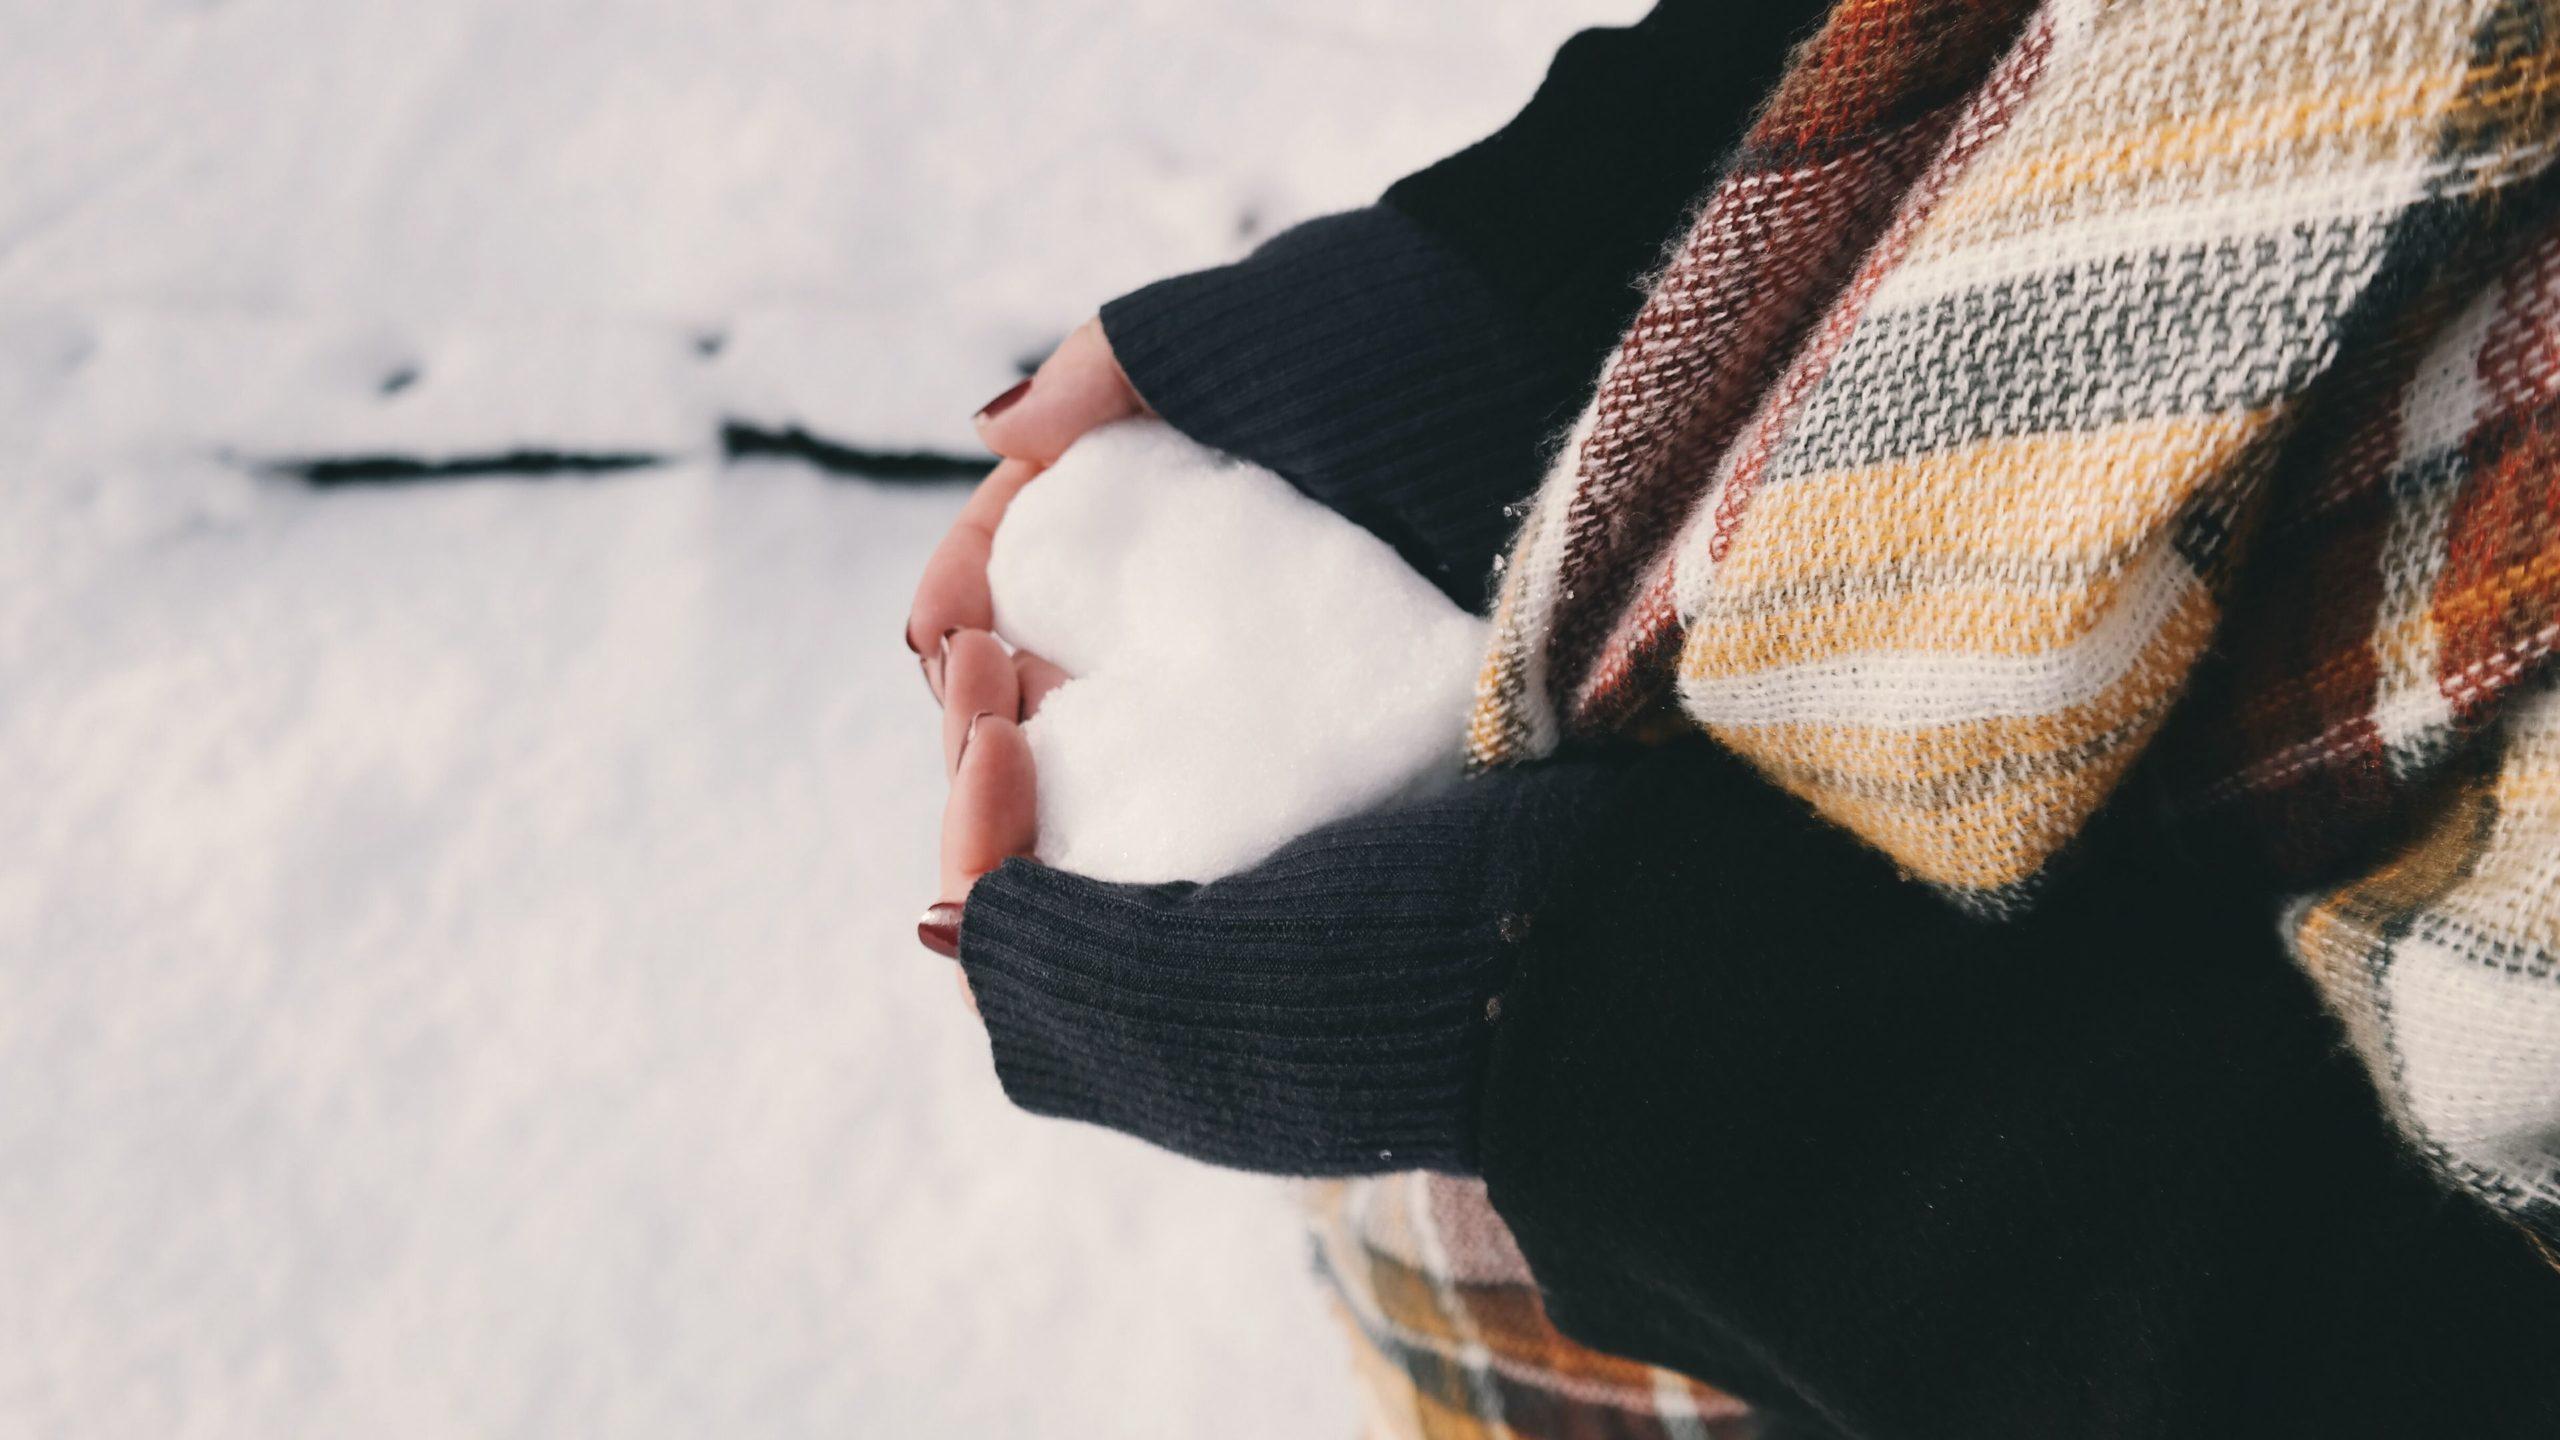 snow wallpaper 1920x1080